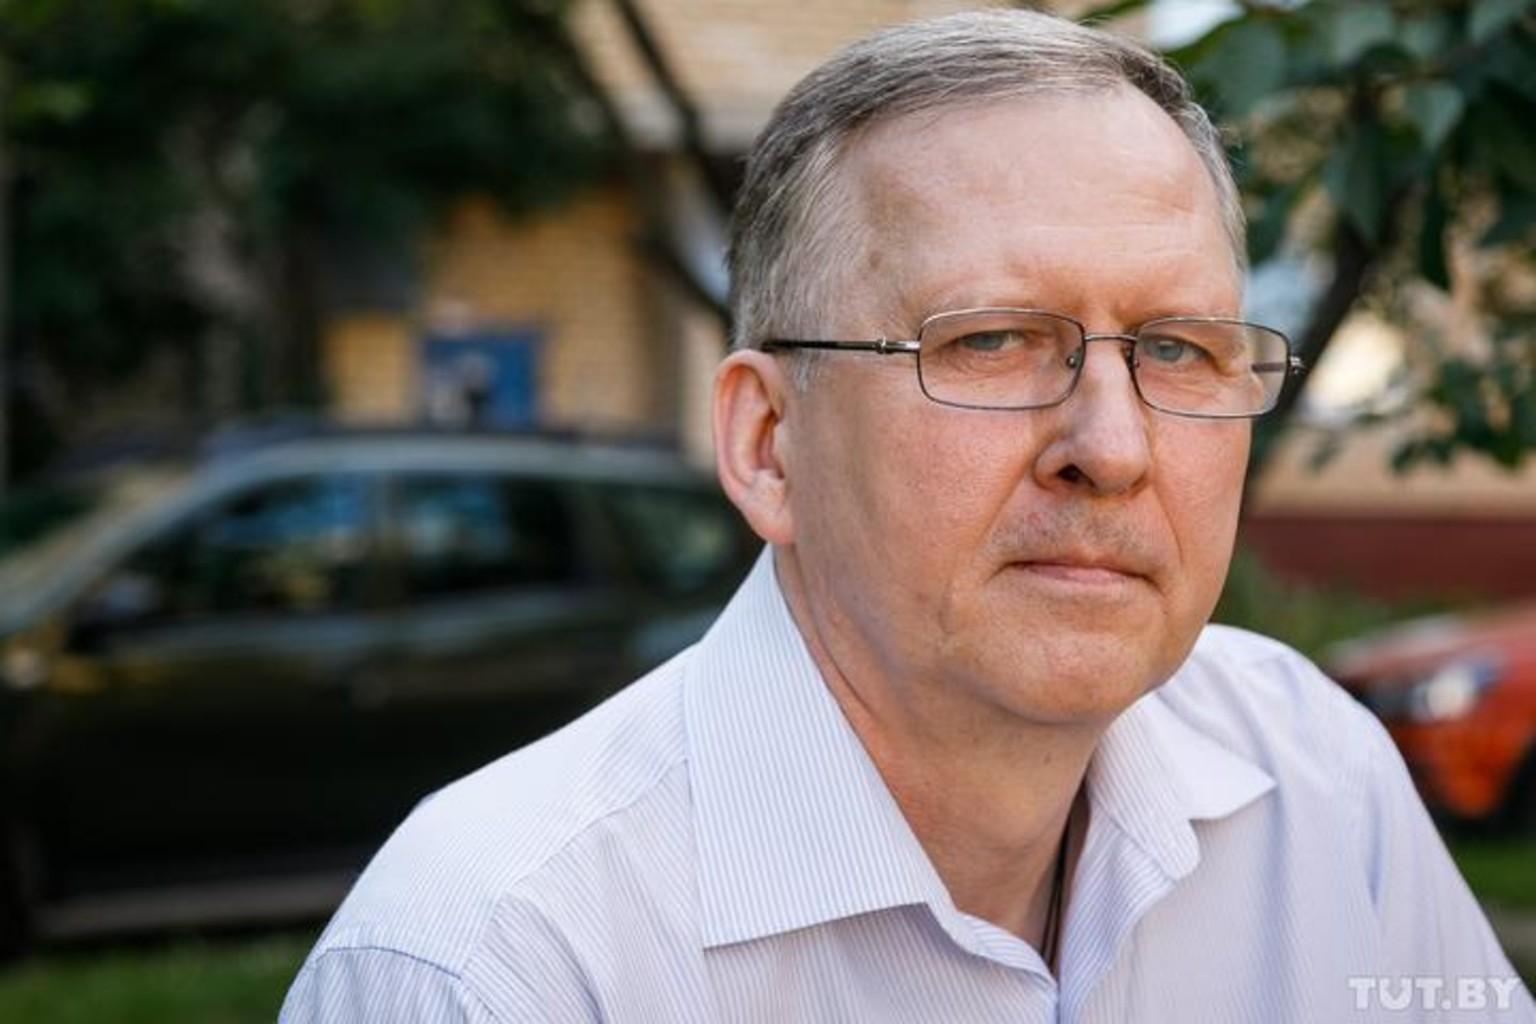 Andrei golovach mzkt 20190724 shuk tutby phsl 0921